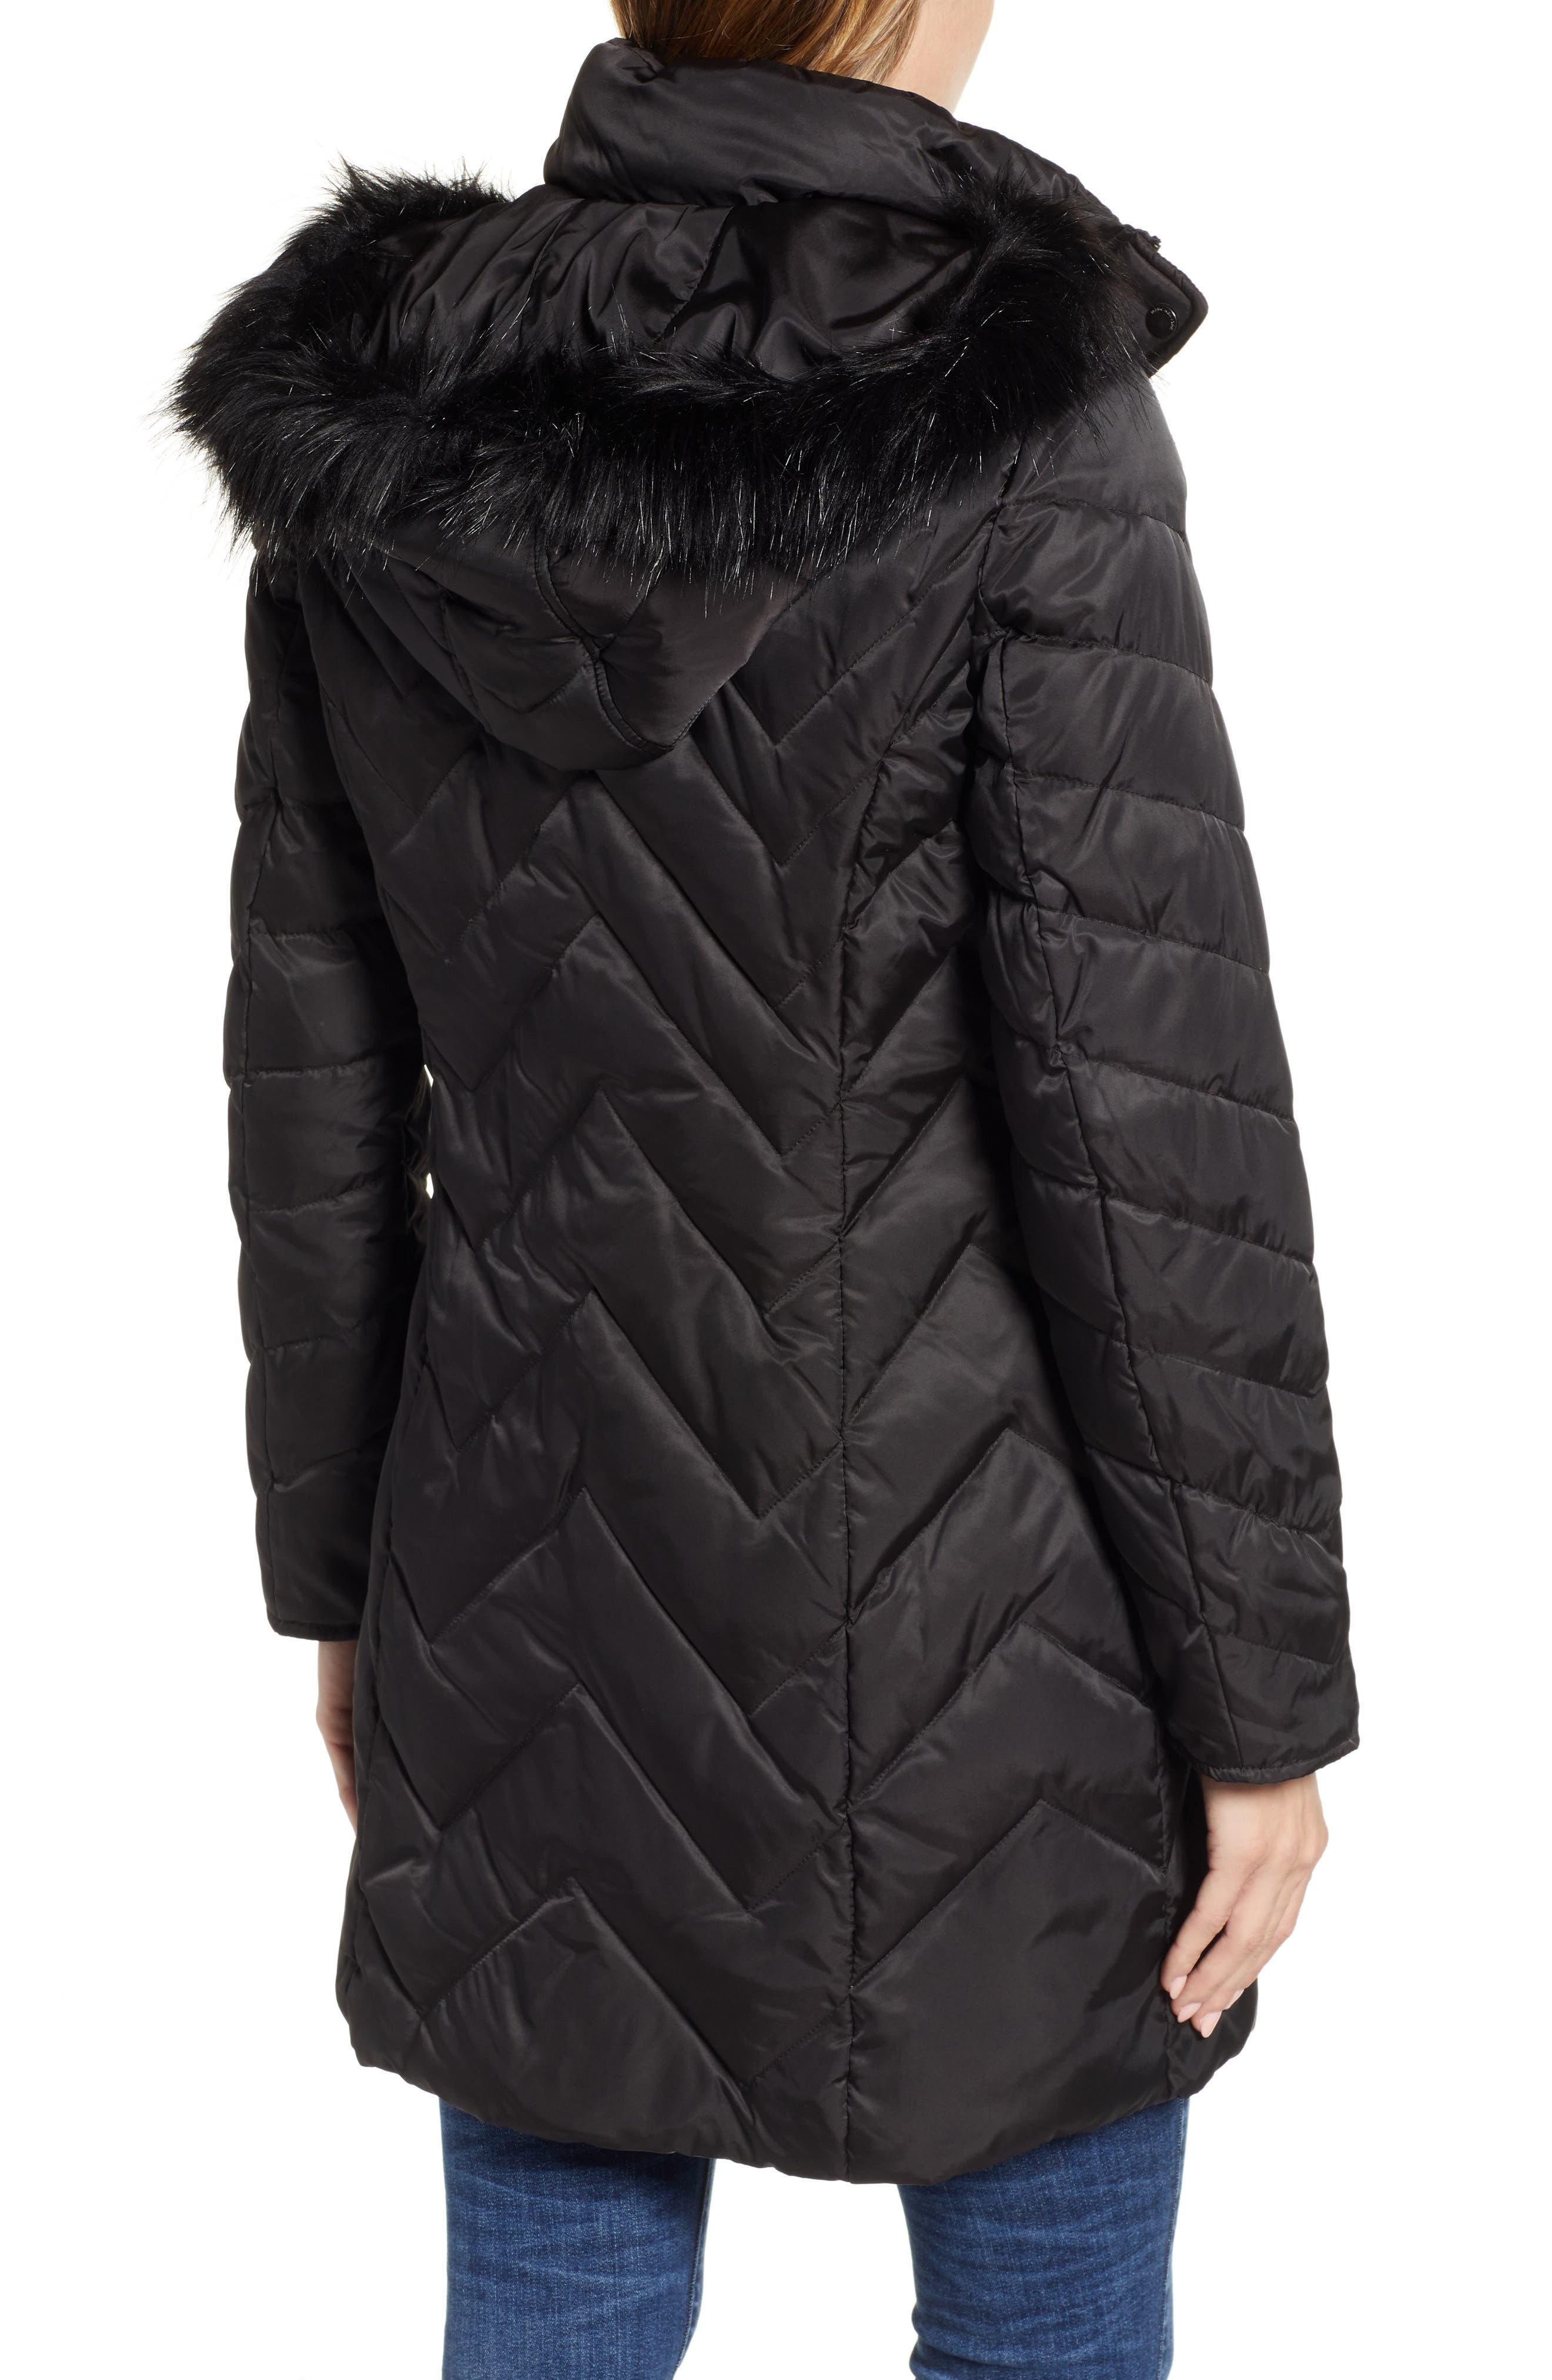 MARC NEW YORK, Matte Satin Chevron Faux Fur Trim Coat, Alternate thumbnail 2, color, BLACK